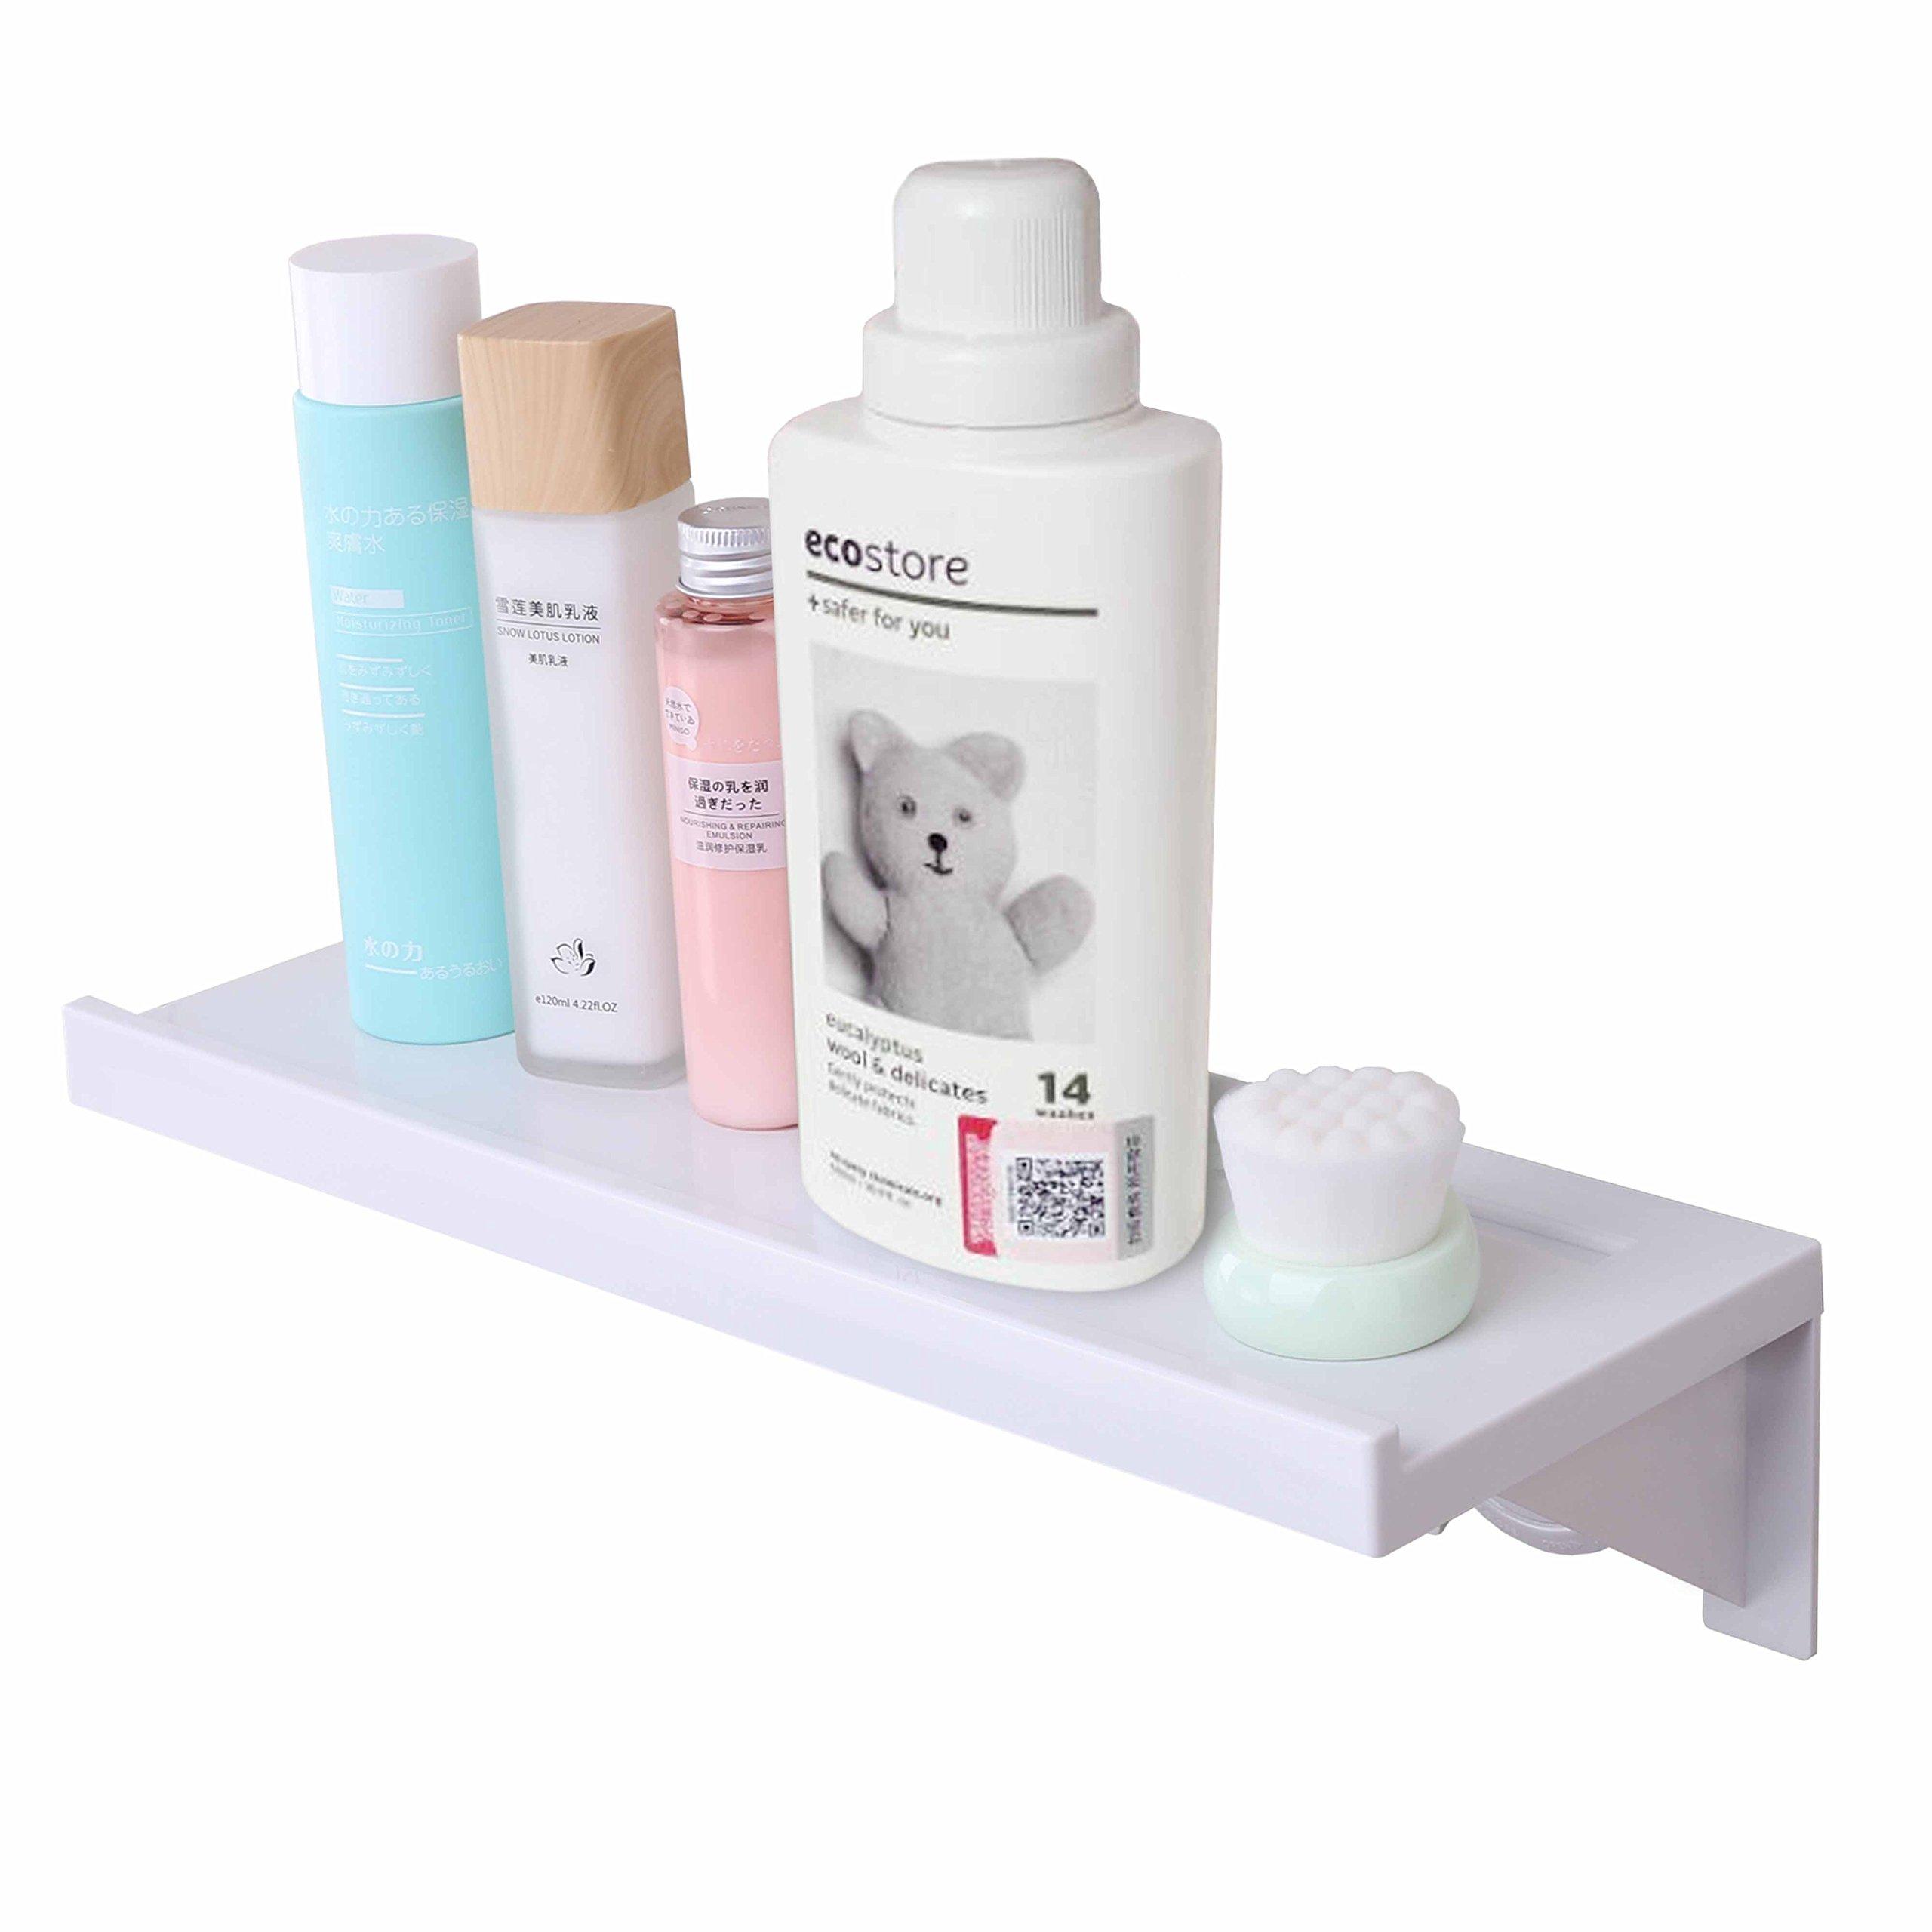 Wall Shelf with Stick on Adhesive 3 Adoraland Bathroom Organiser Shower Caddy